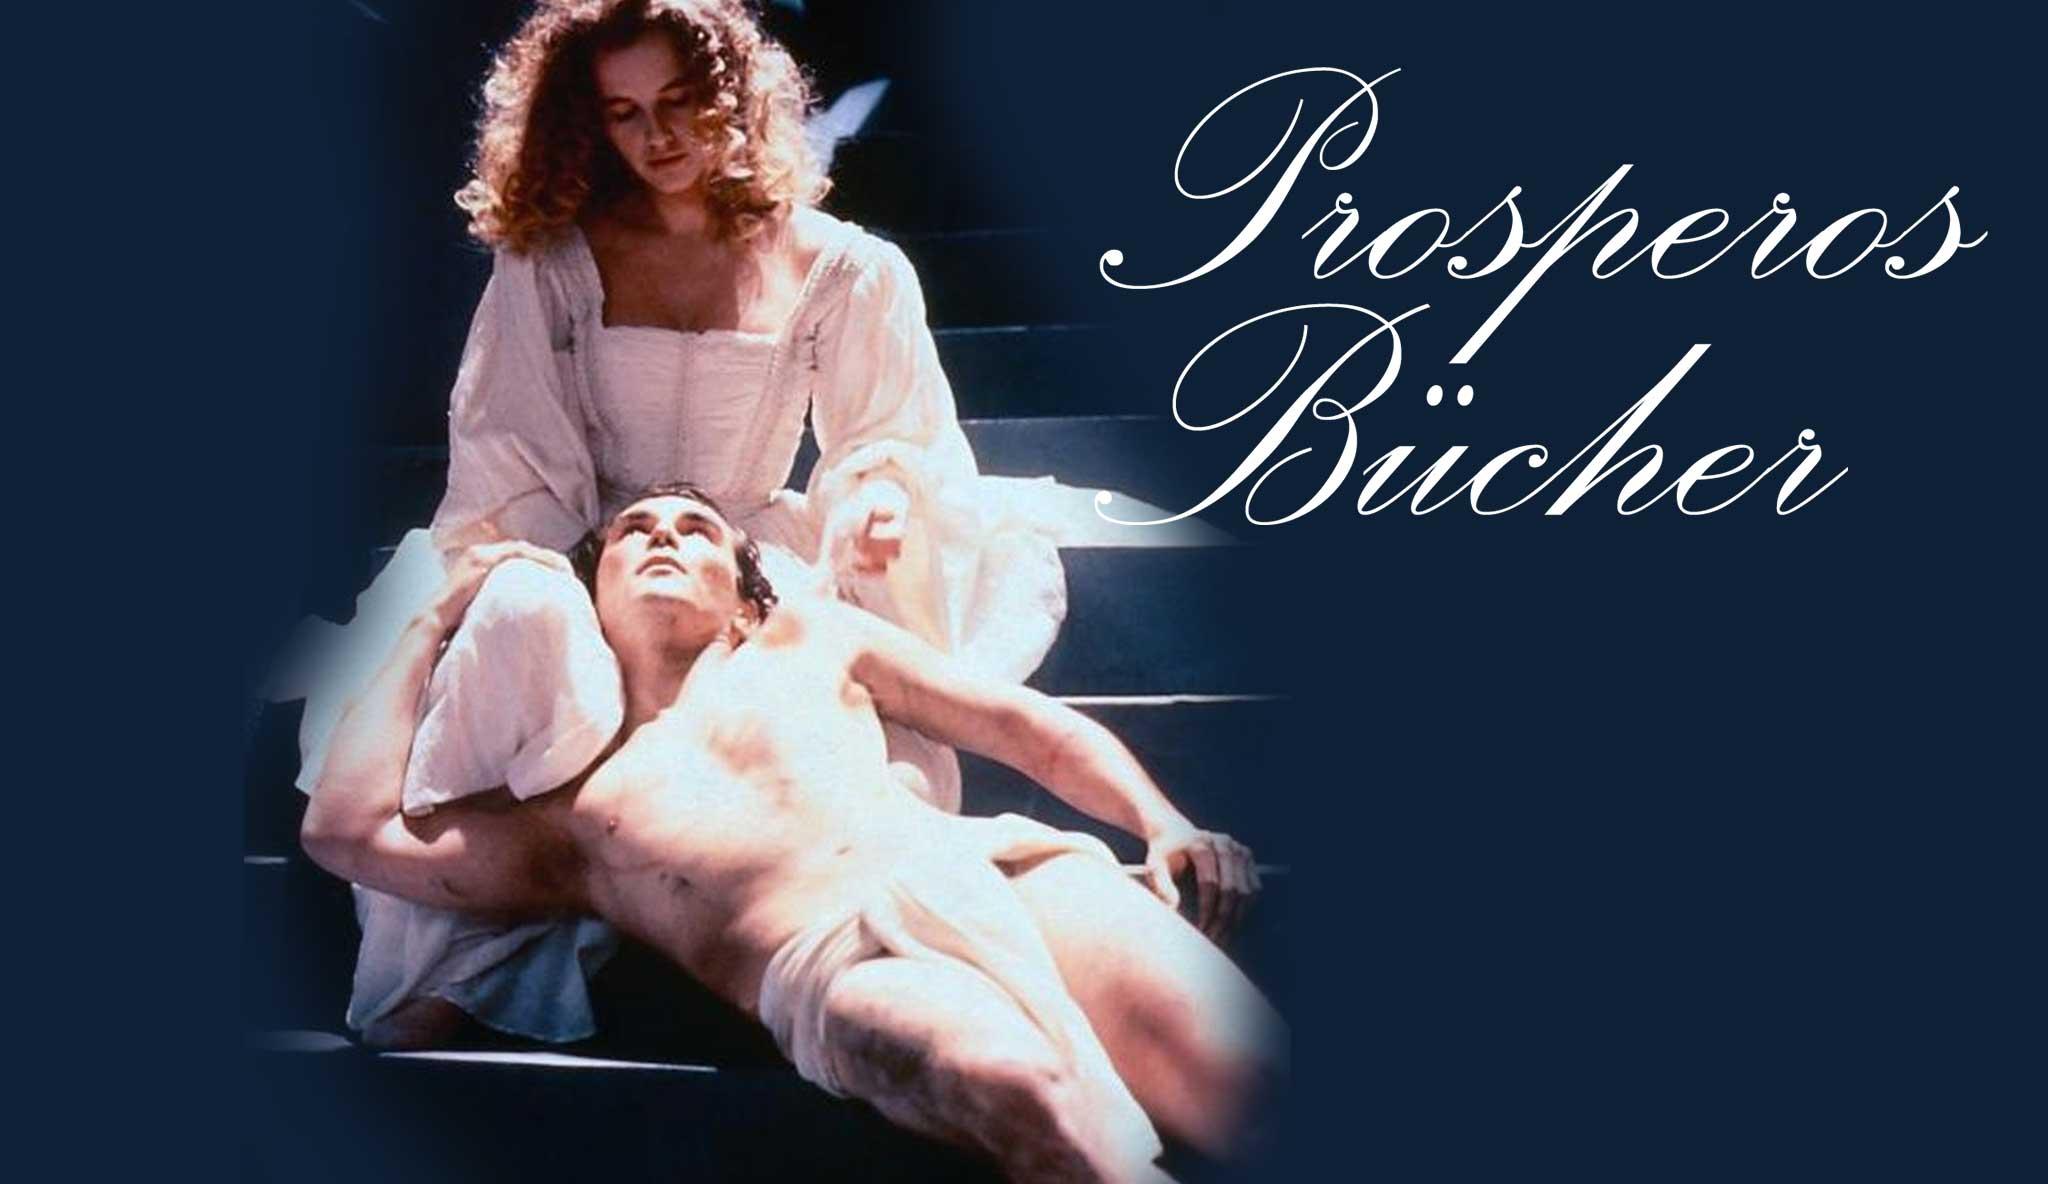 prosperos-bucher\header.jpg